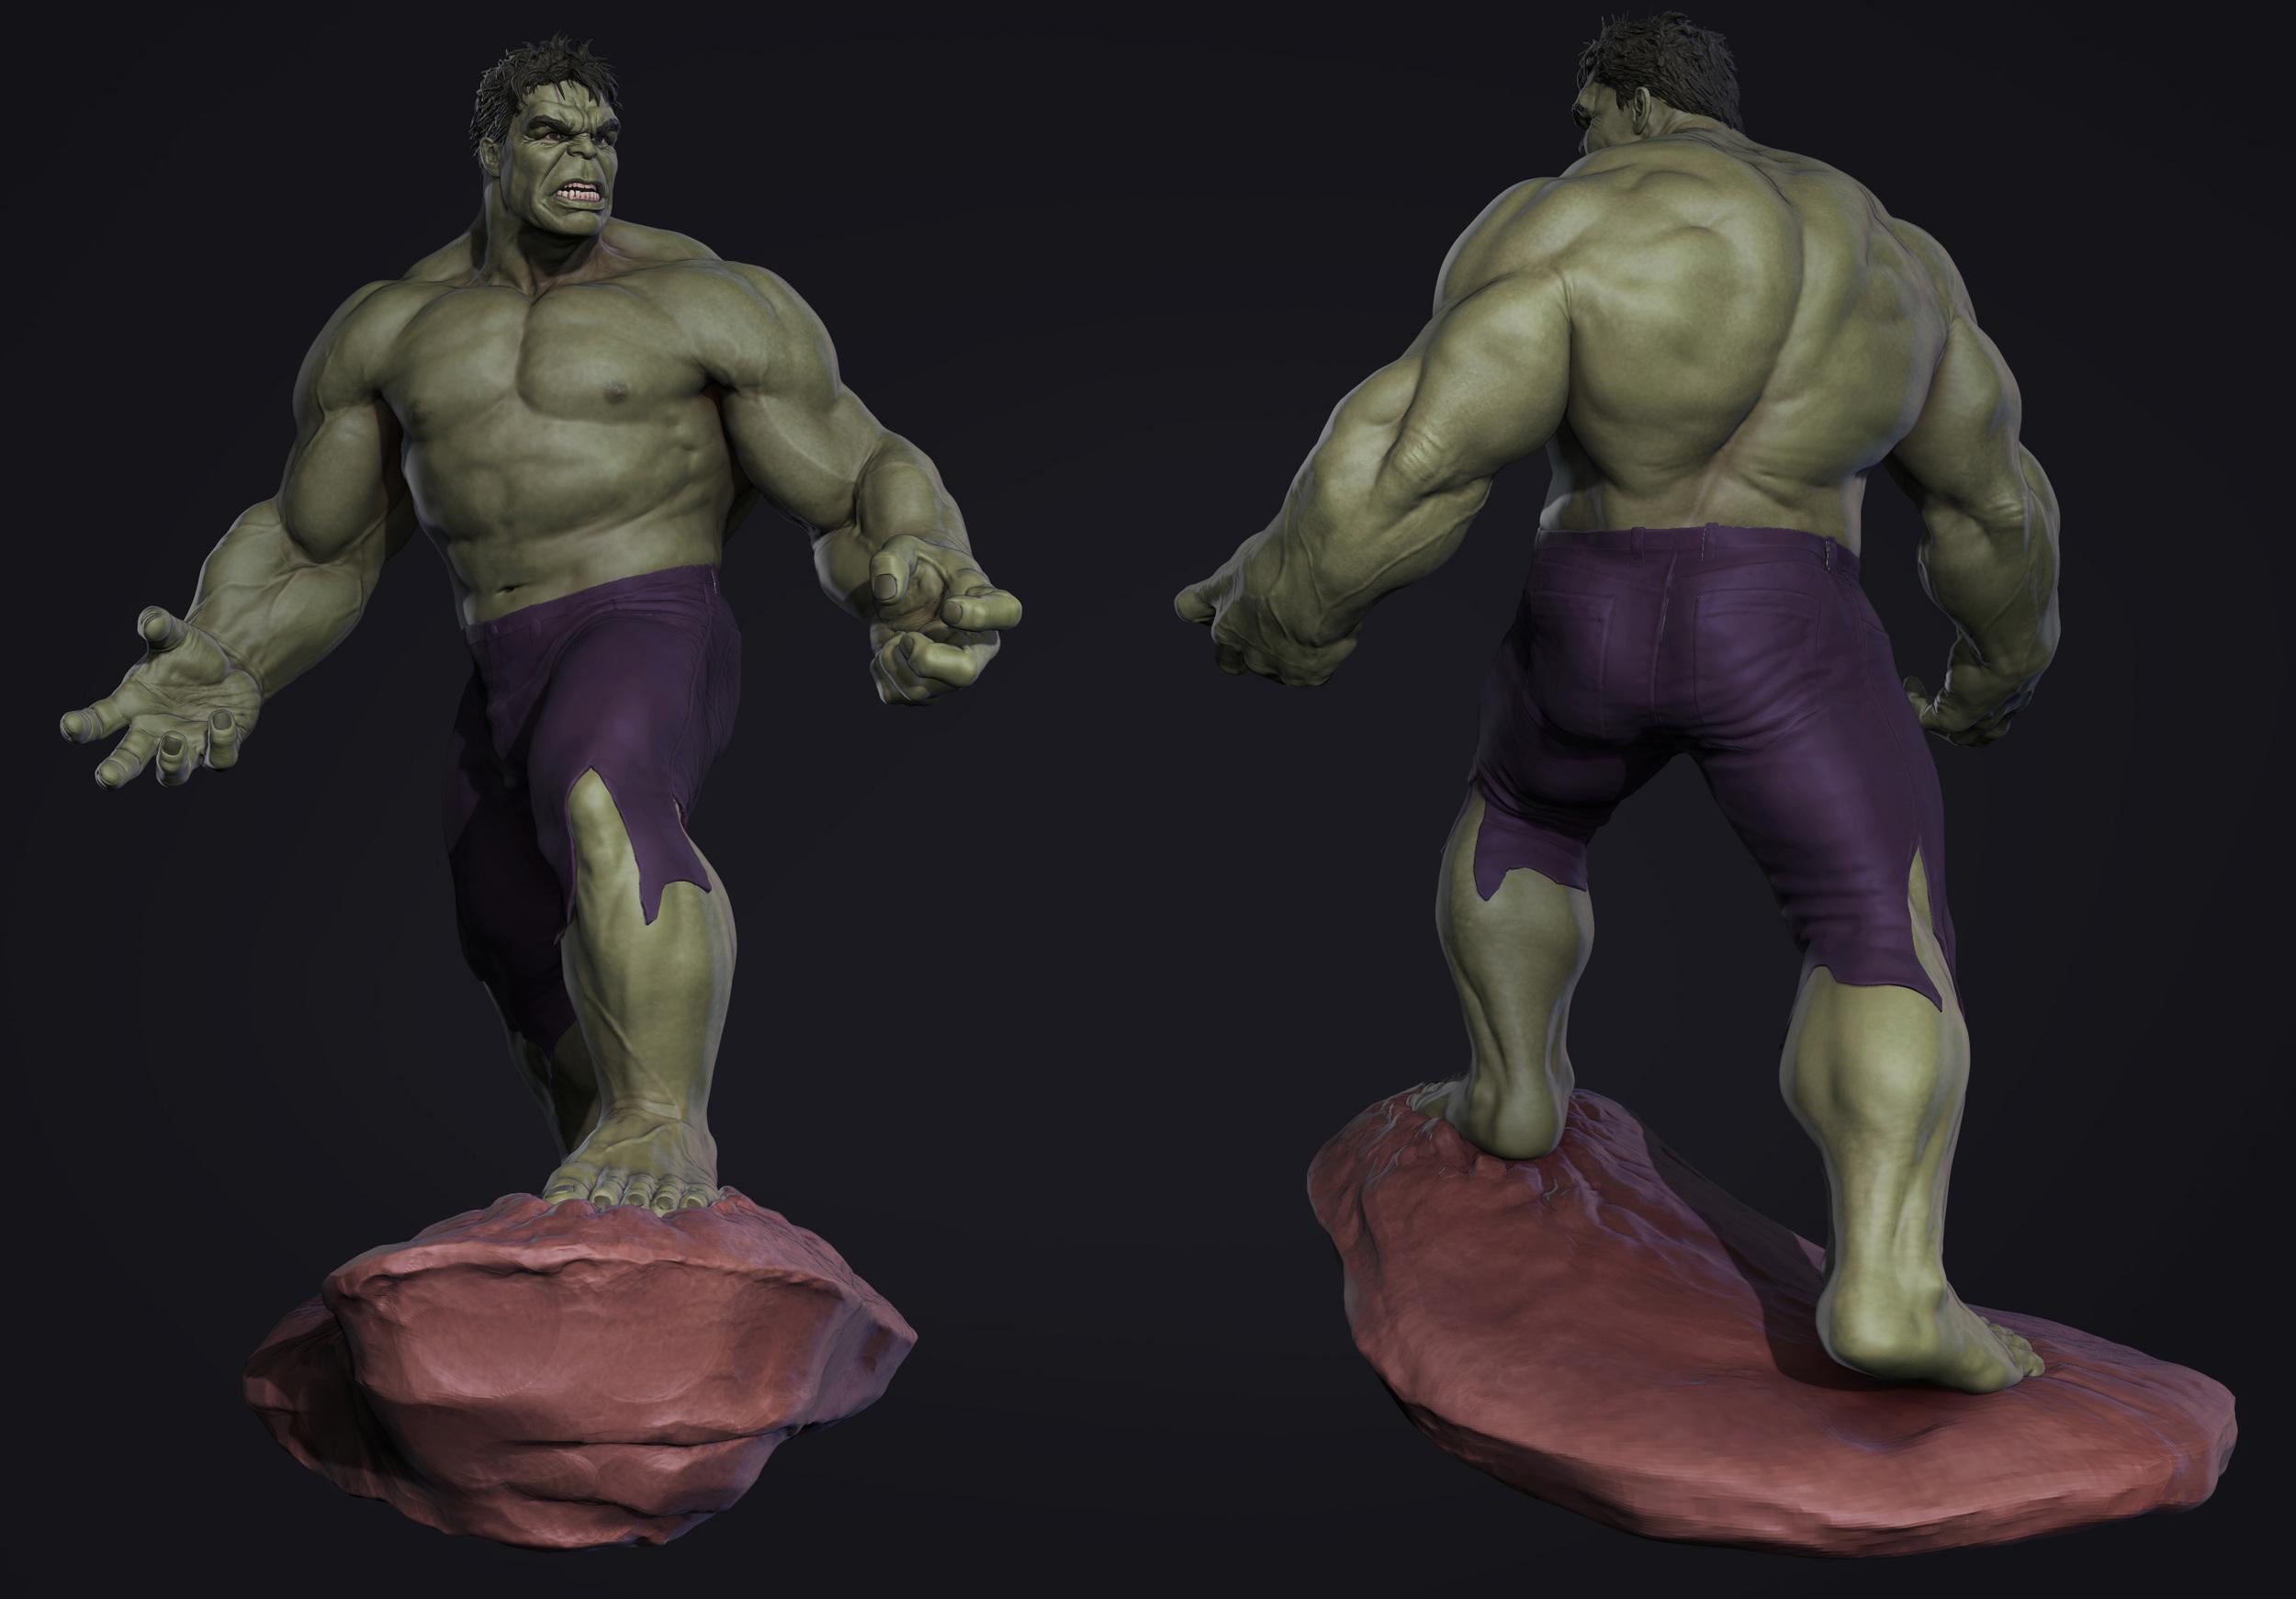 droidsforsale-the-hulk-design-maquette.jpg